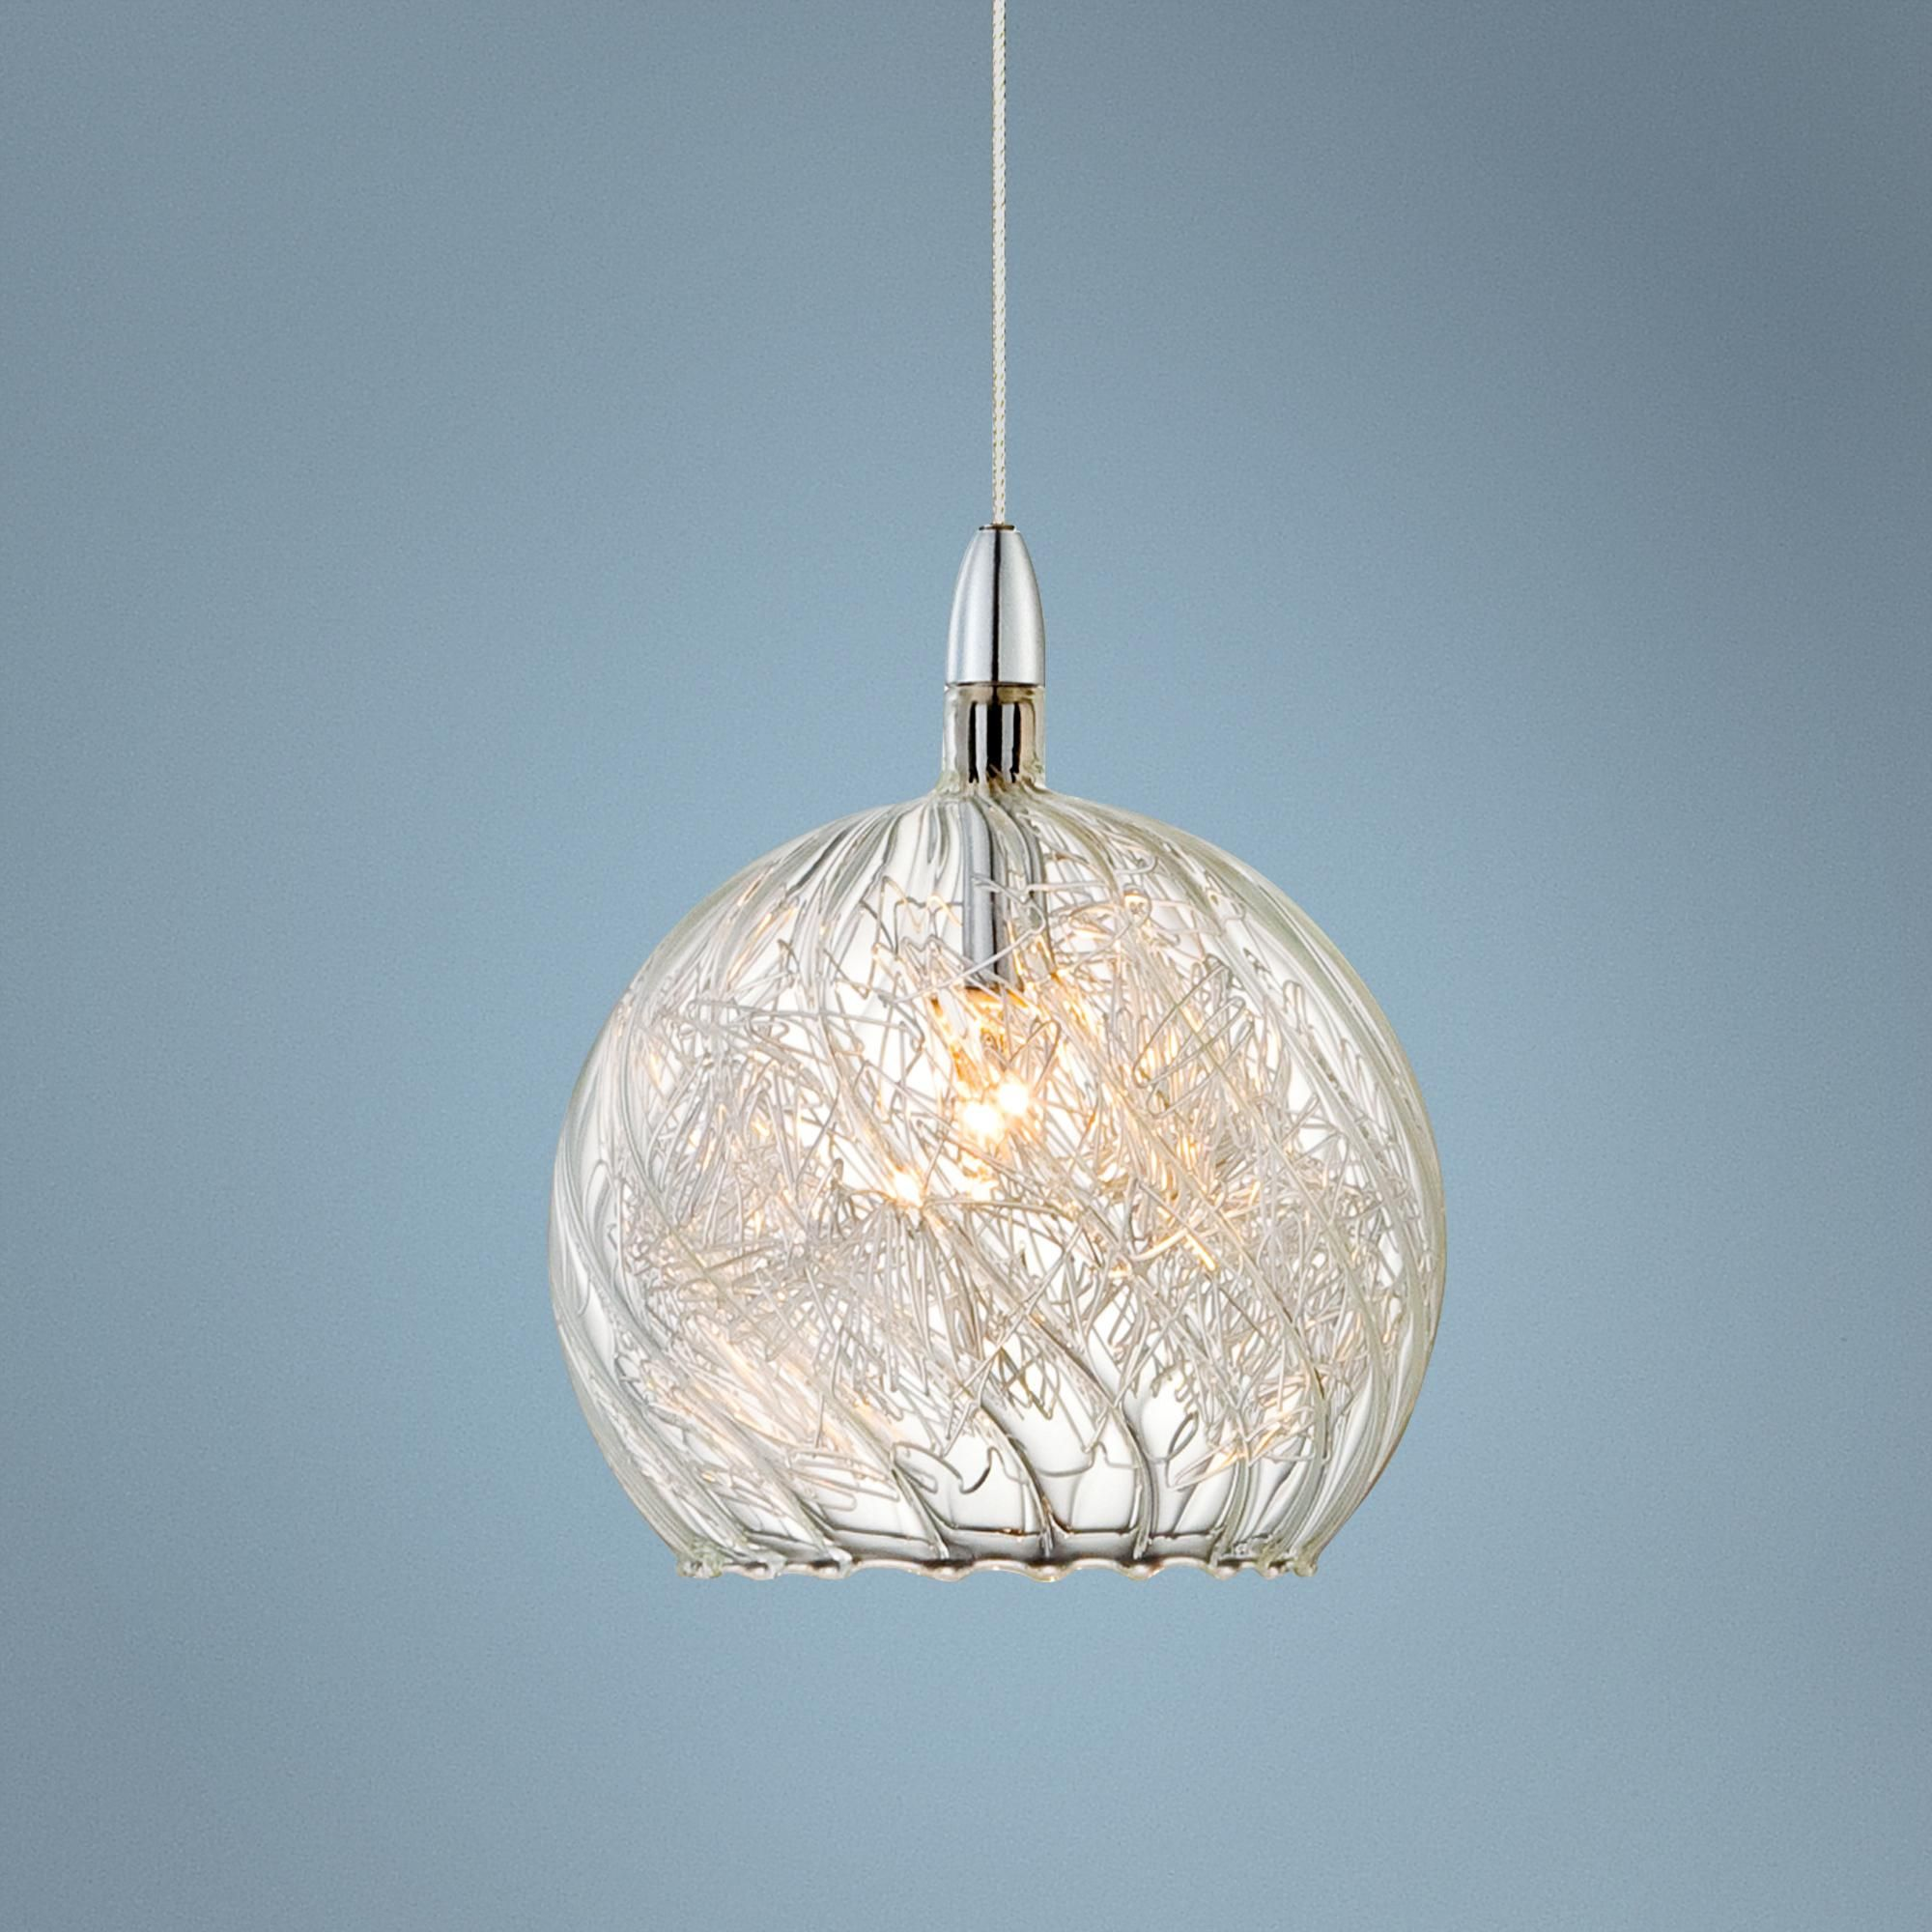 possini euro design lighting. Possini Euro 4 1/2\ Design Lighting